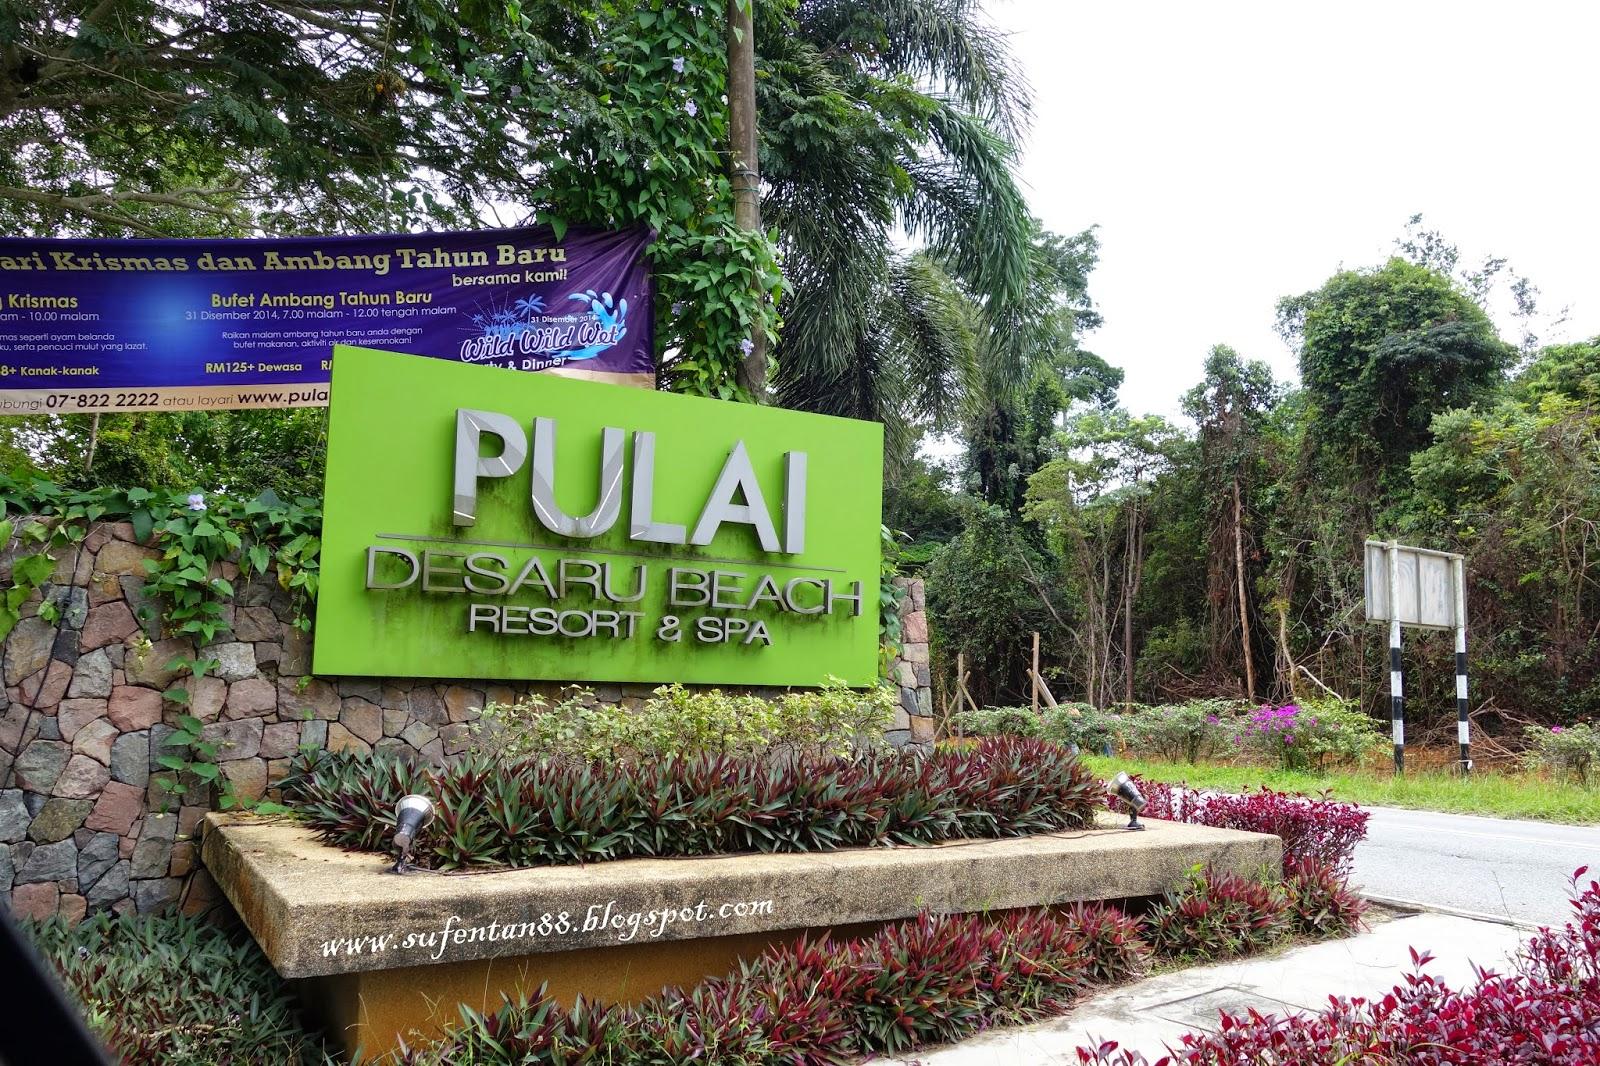 Desaru Beach Review Review on Pulai Desaru Beach